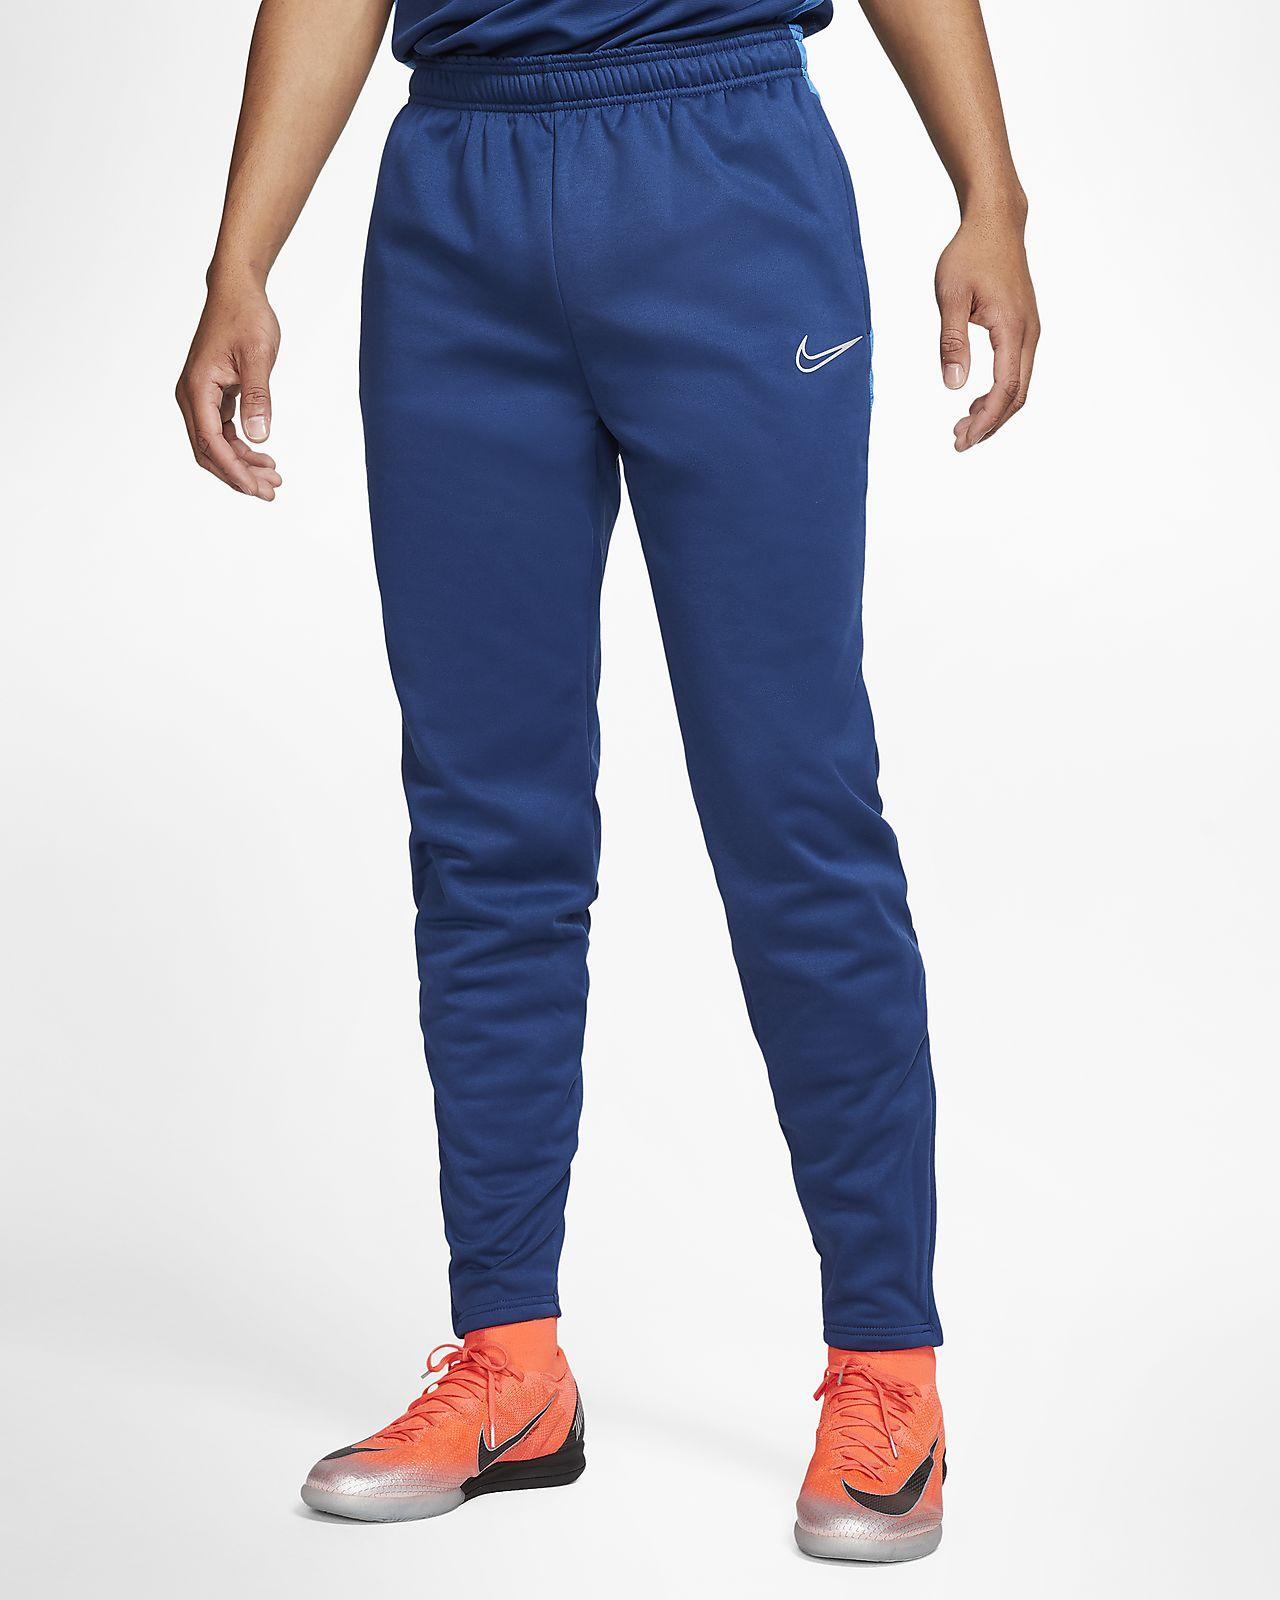 Pantalones de fútbol para hombre Nike Therma Academy